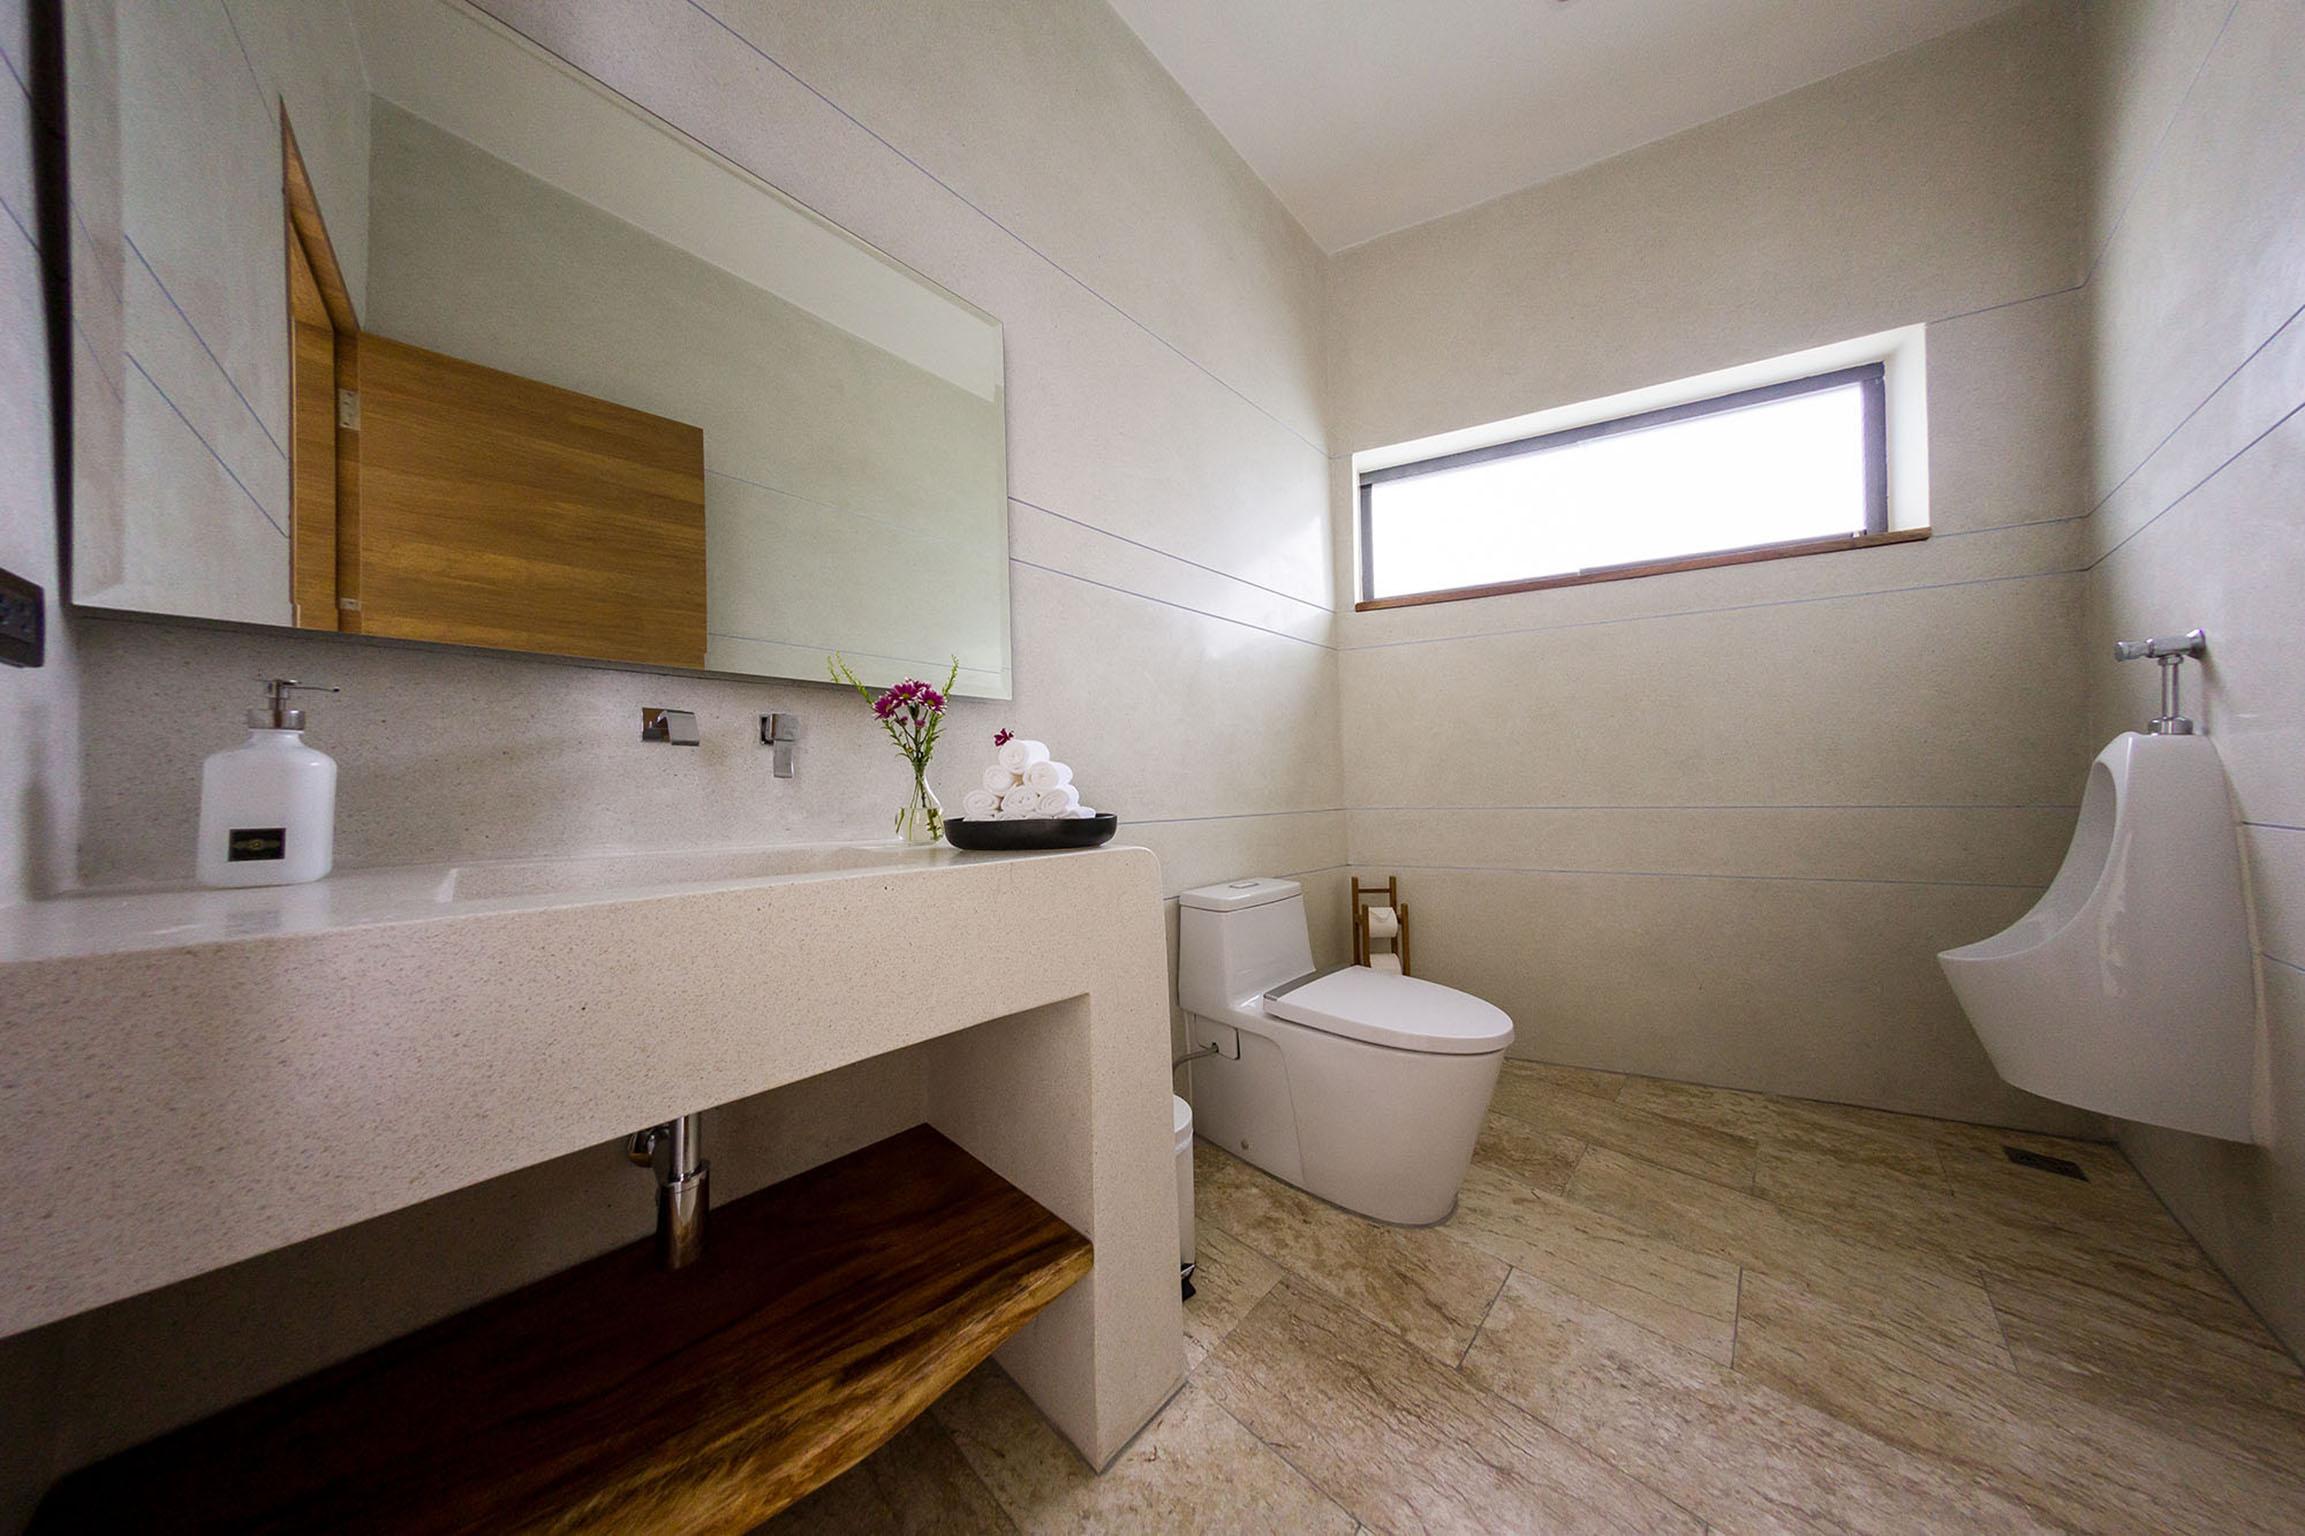 Dining area bathroom